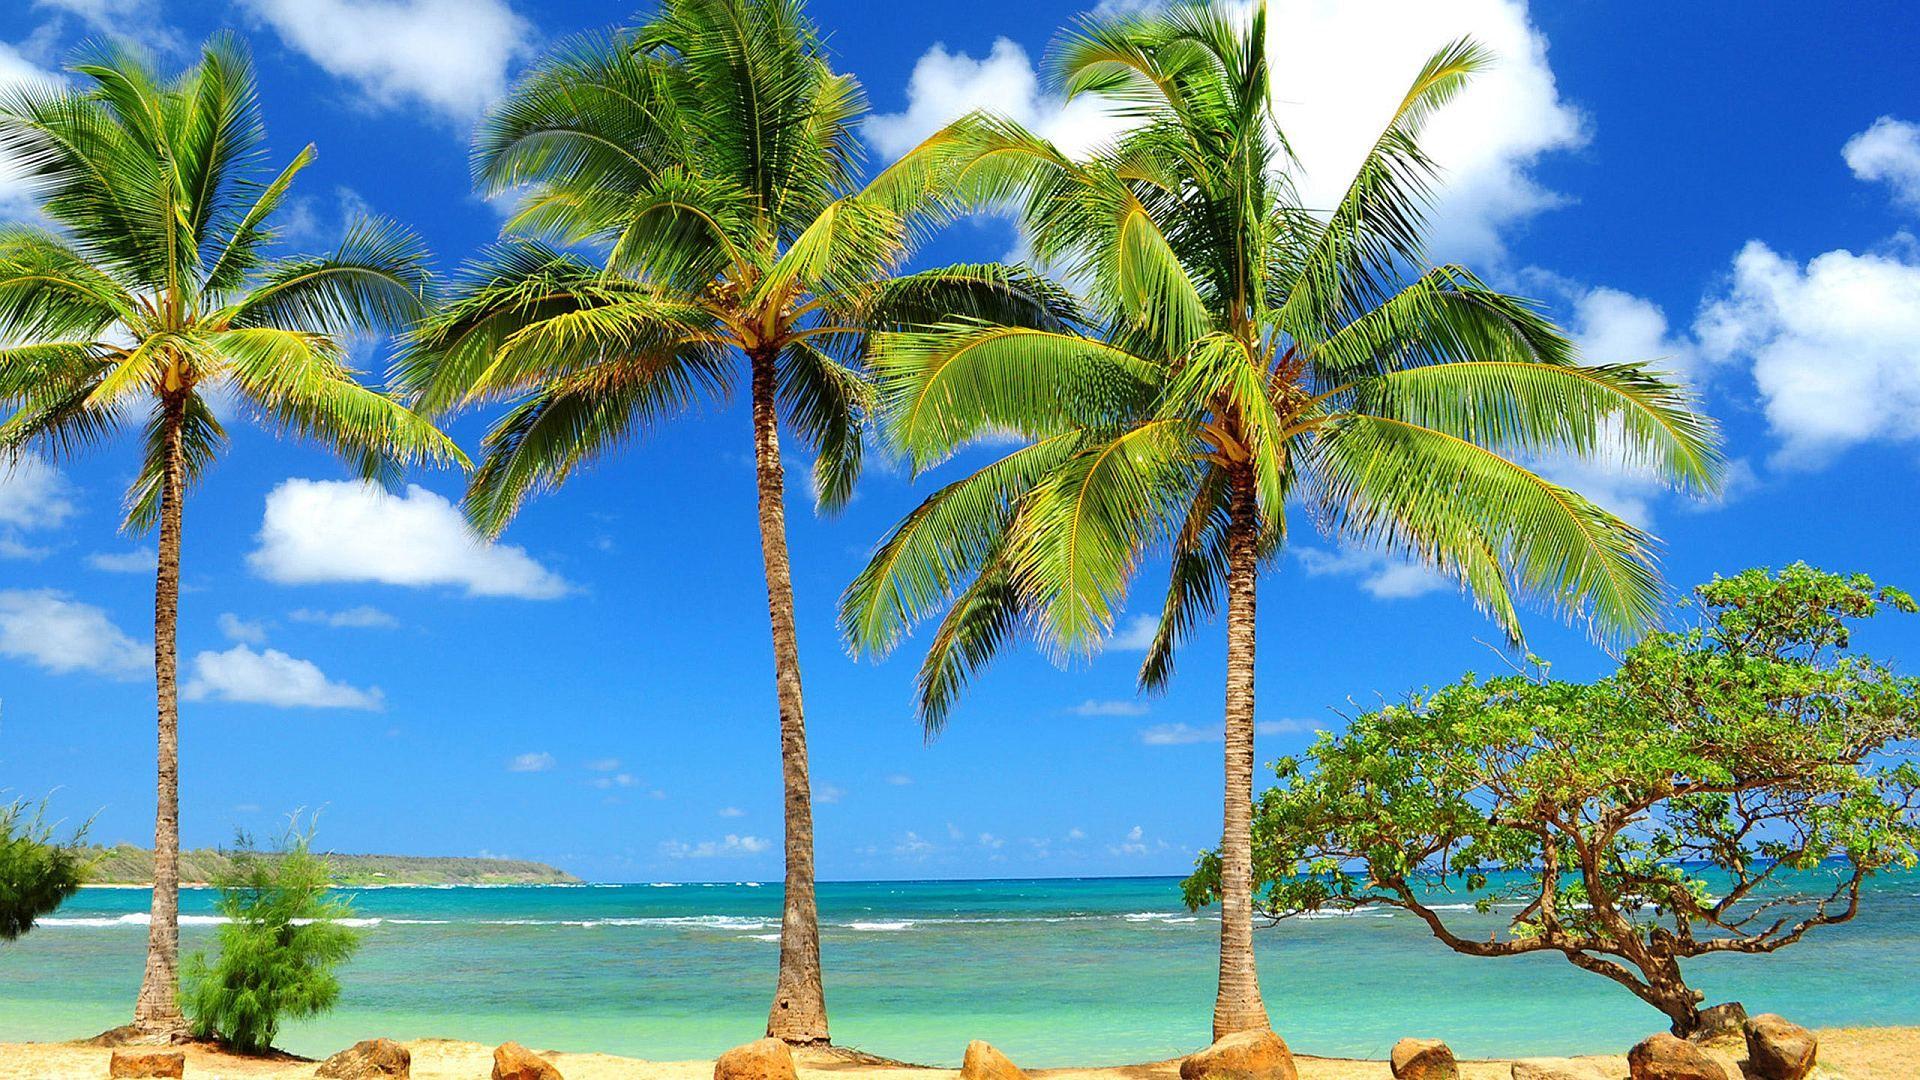 Caribbean desktop wallpaper